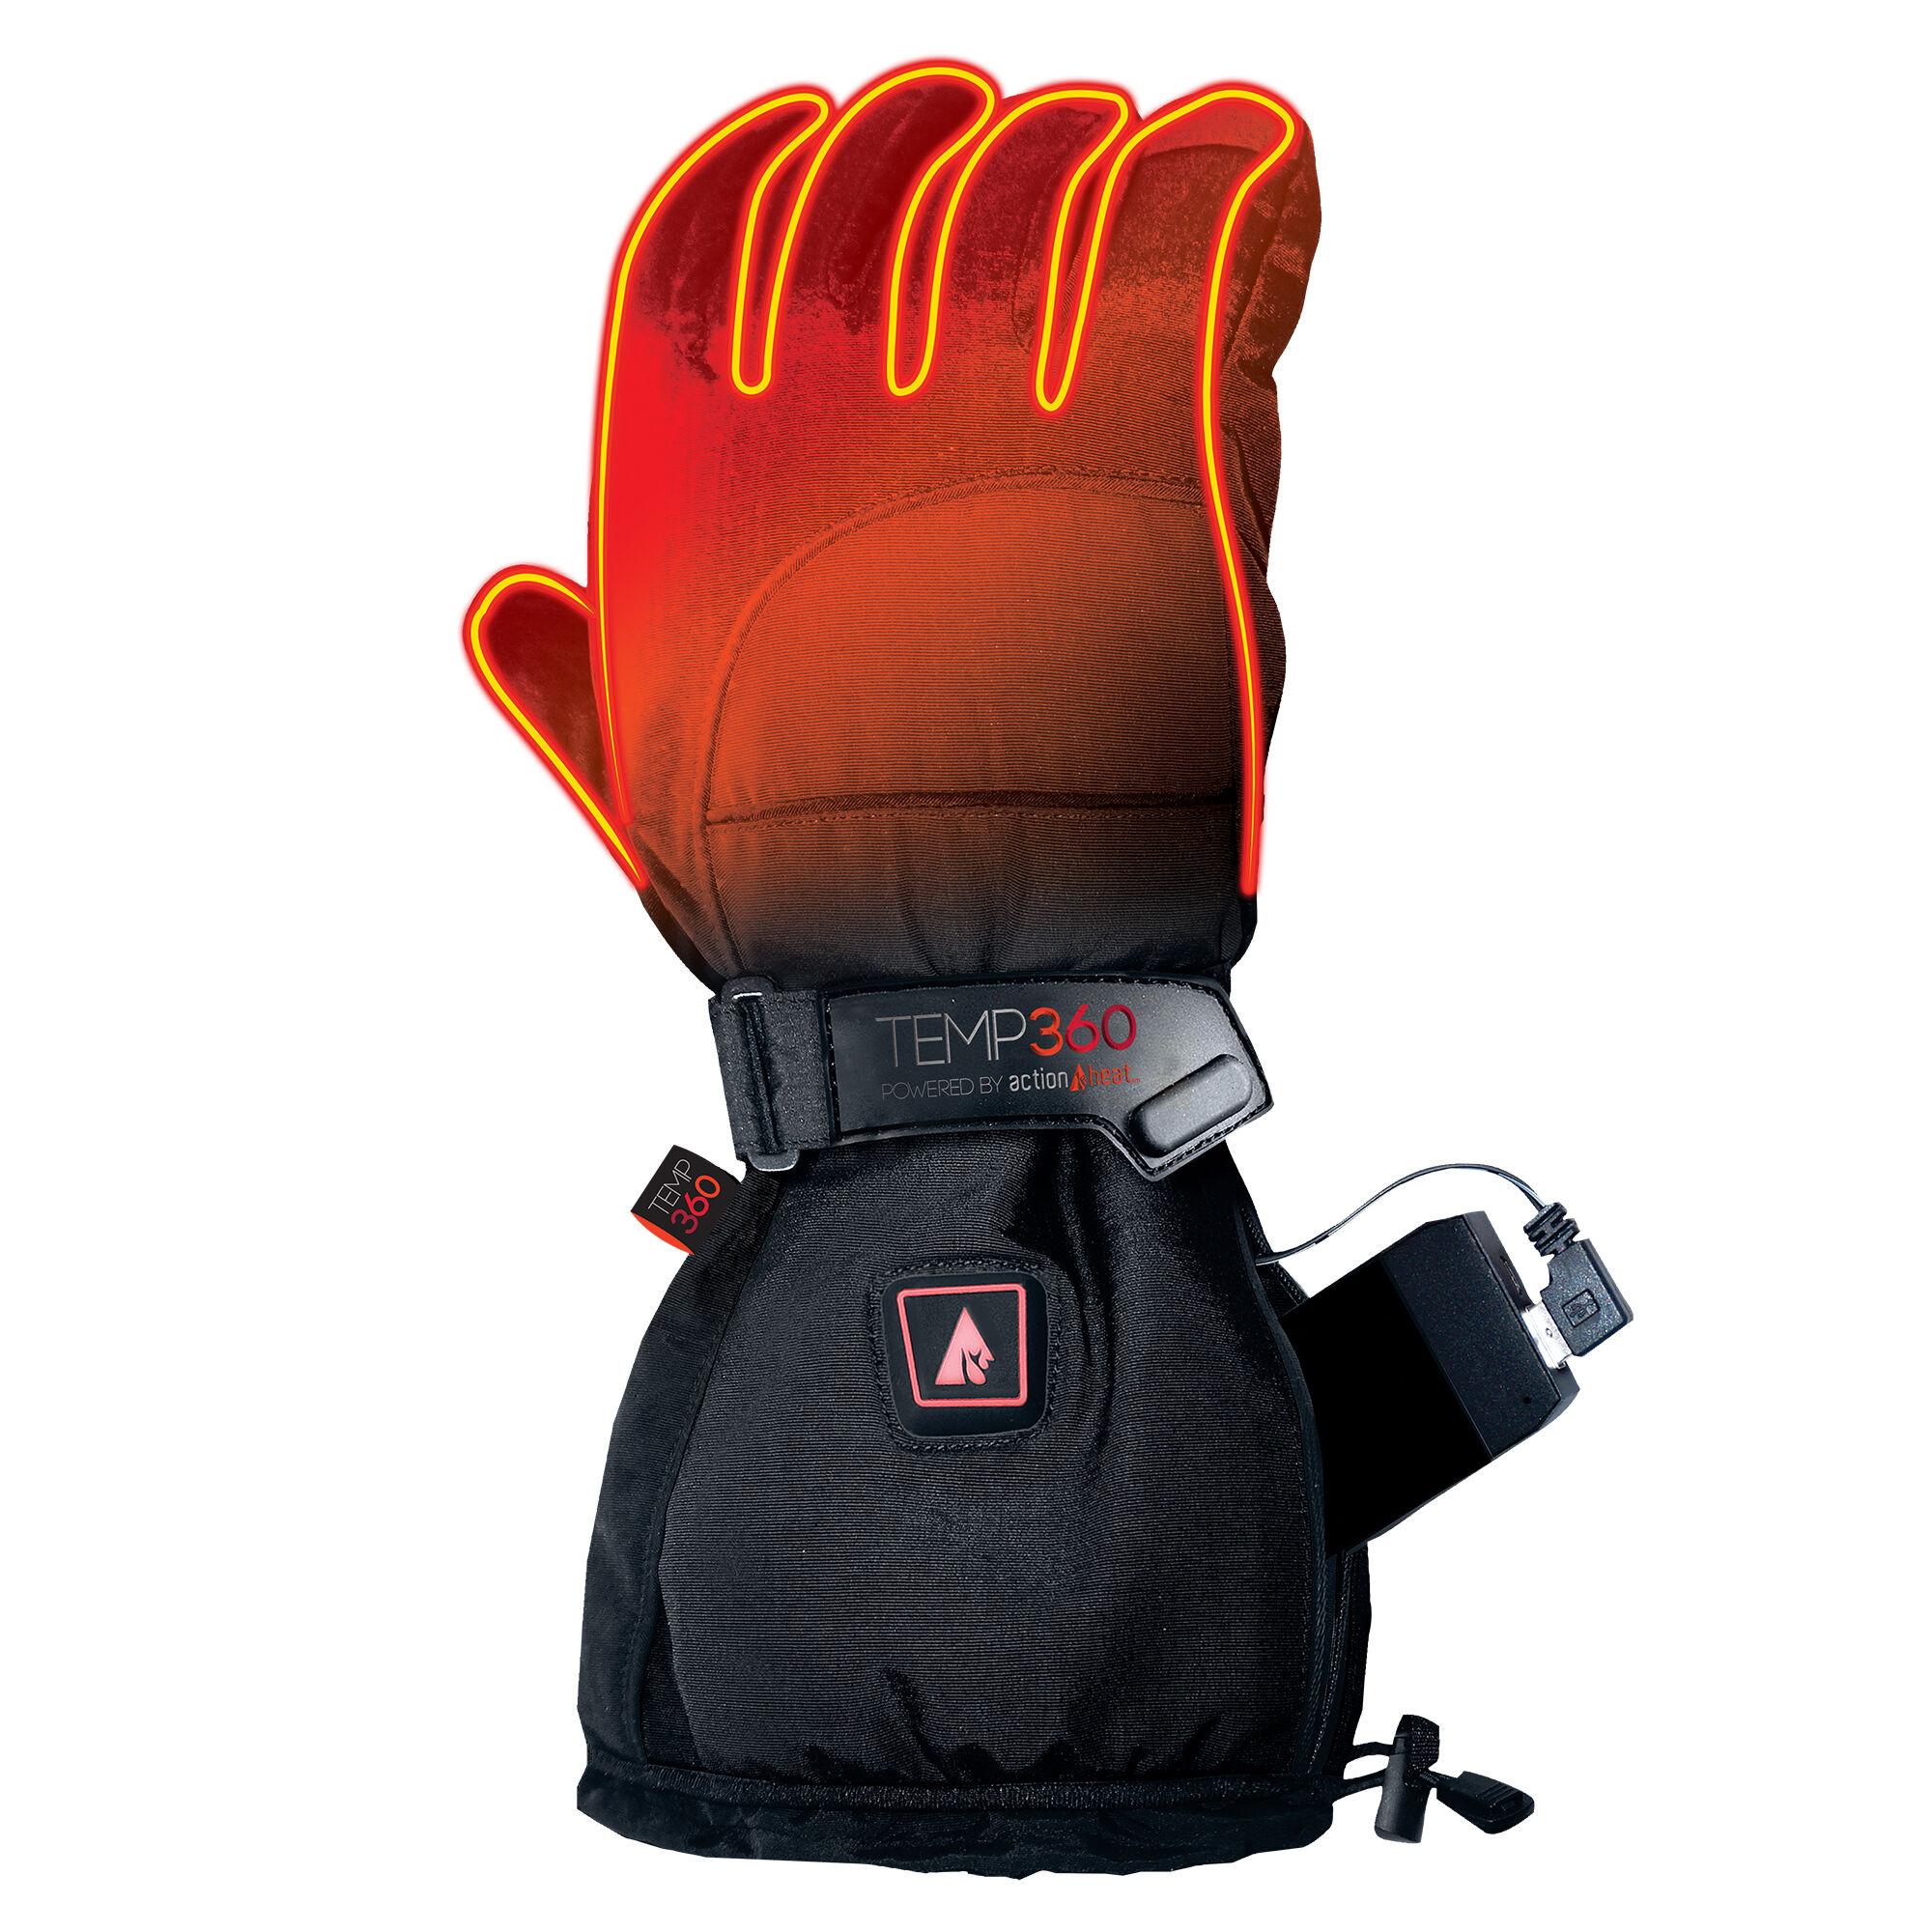 Temp 360 Temp360 Men's 5V Heated Snow Gloves